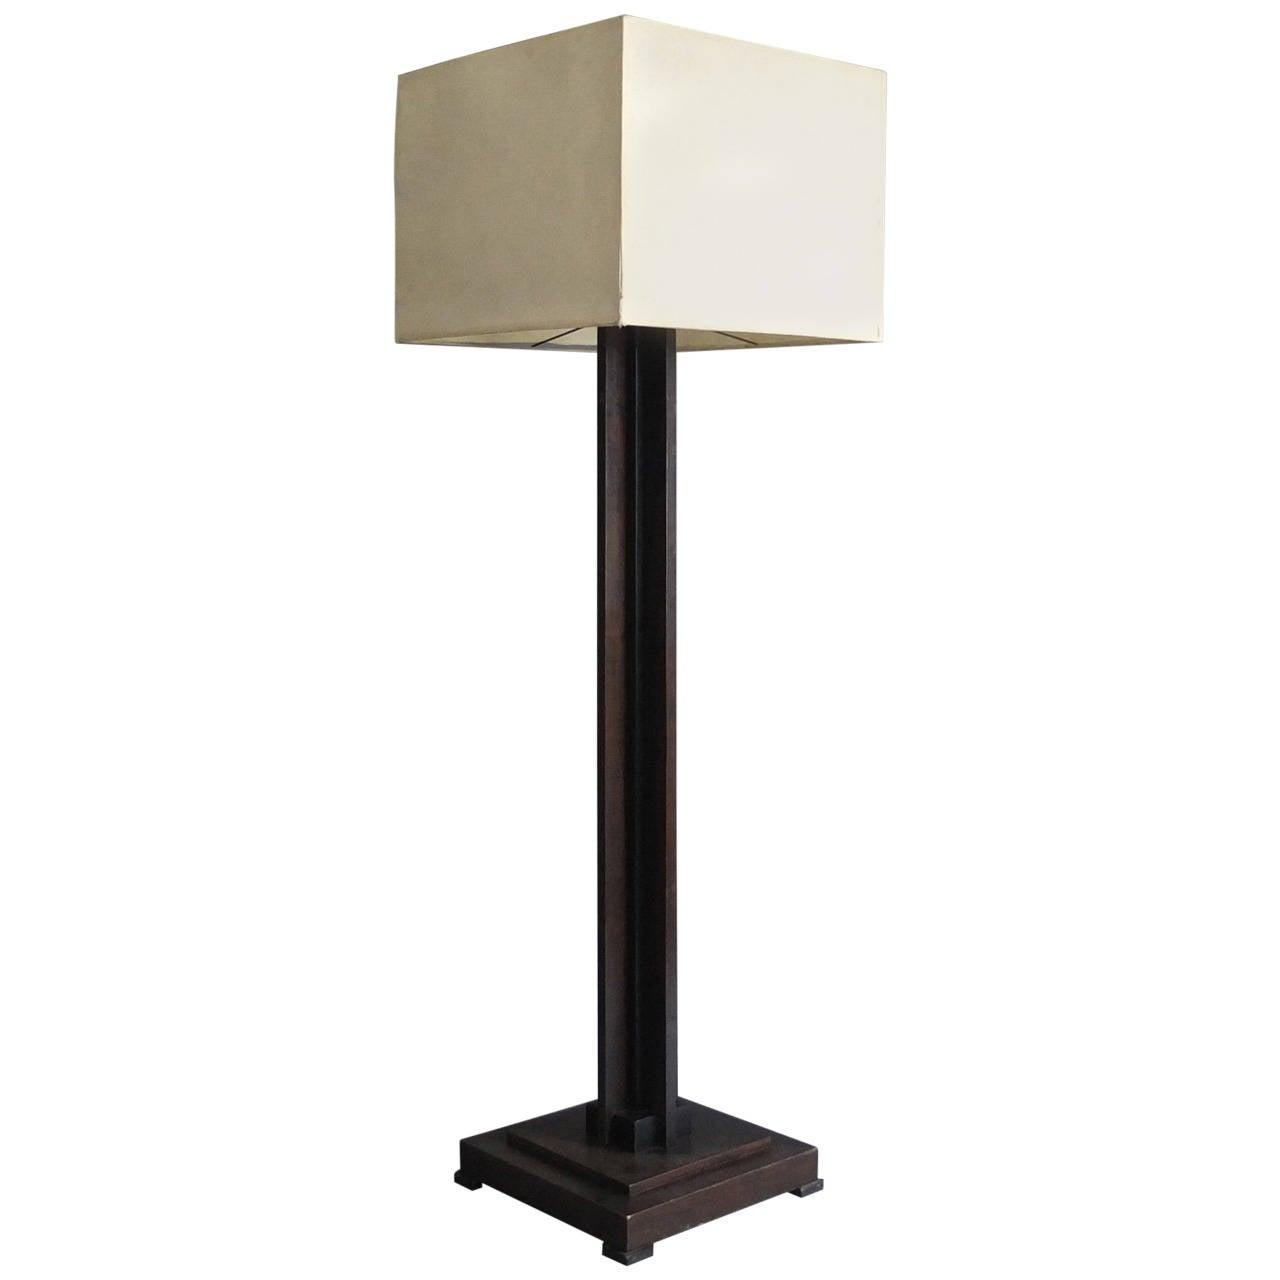 fine french art deco floor lamp at 1stdibs. Black Bedroom Furniture Sets. Home Design Ideas